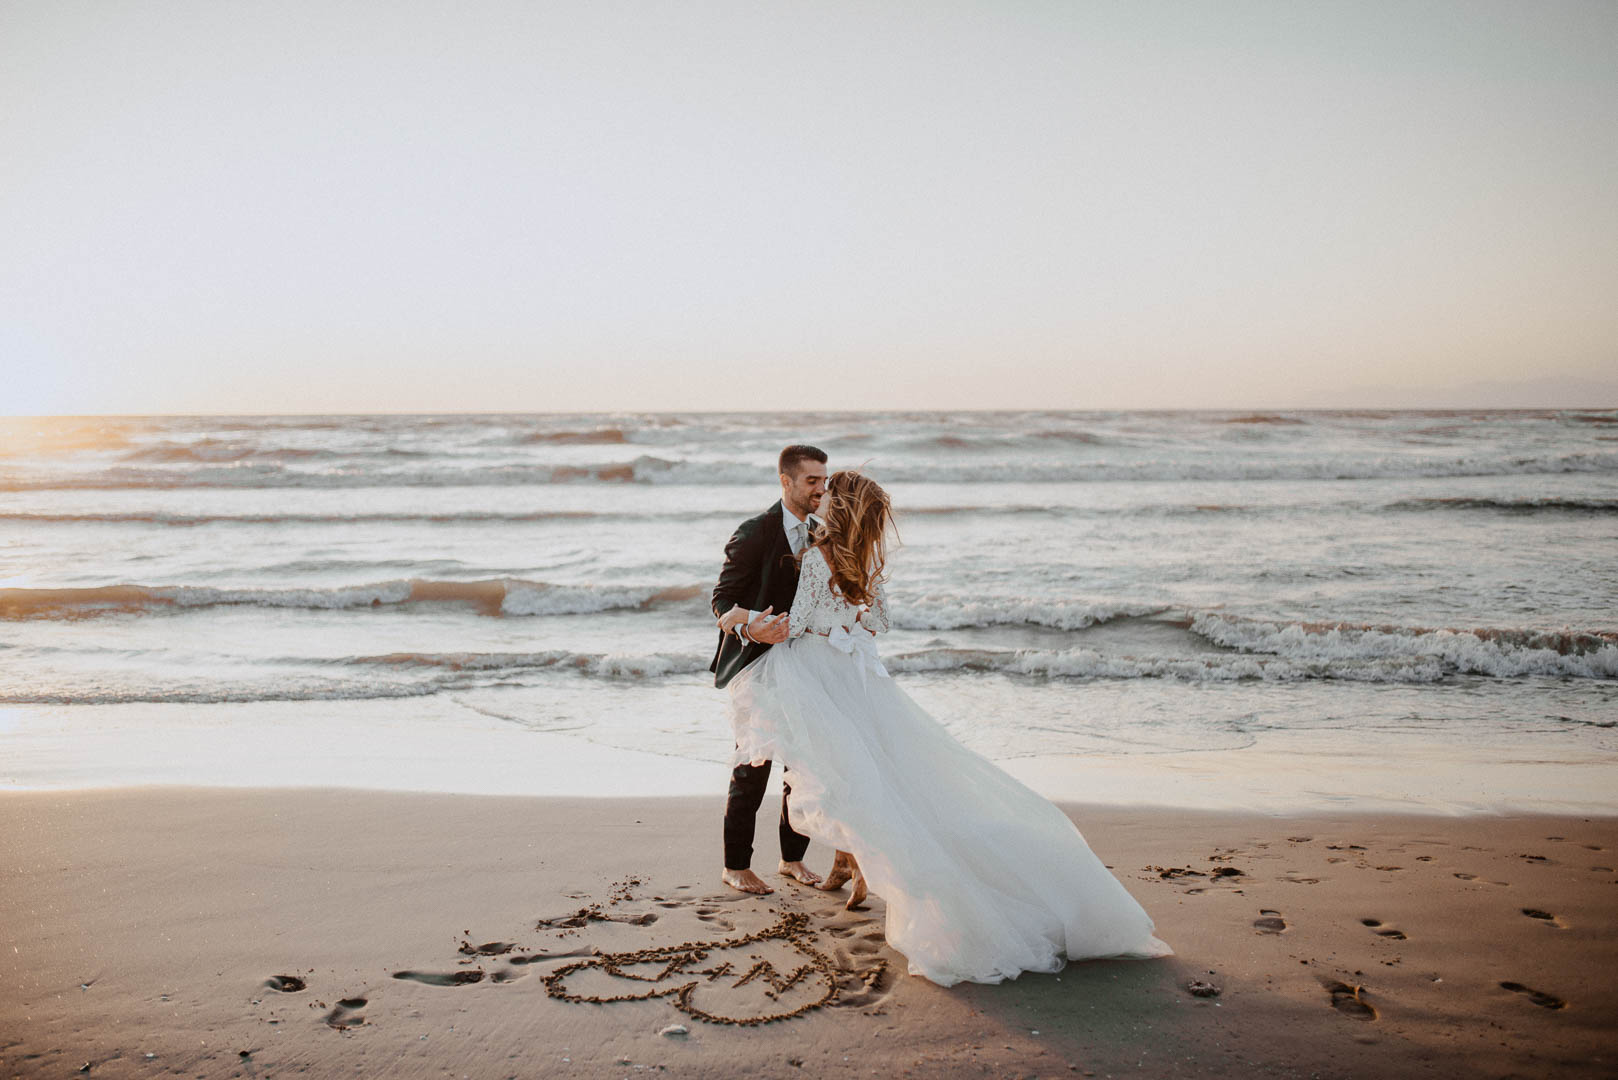 wedding-photographer-destination-fineart-bespoke-reportage-napoli-nabilah-vivianeizzo-spazio46-128